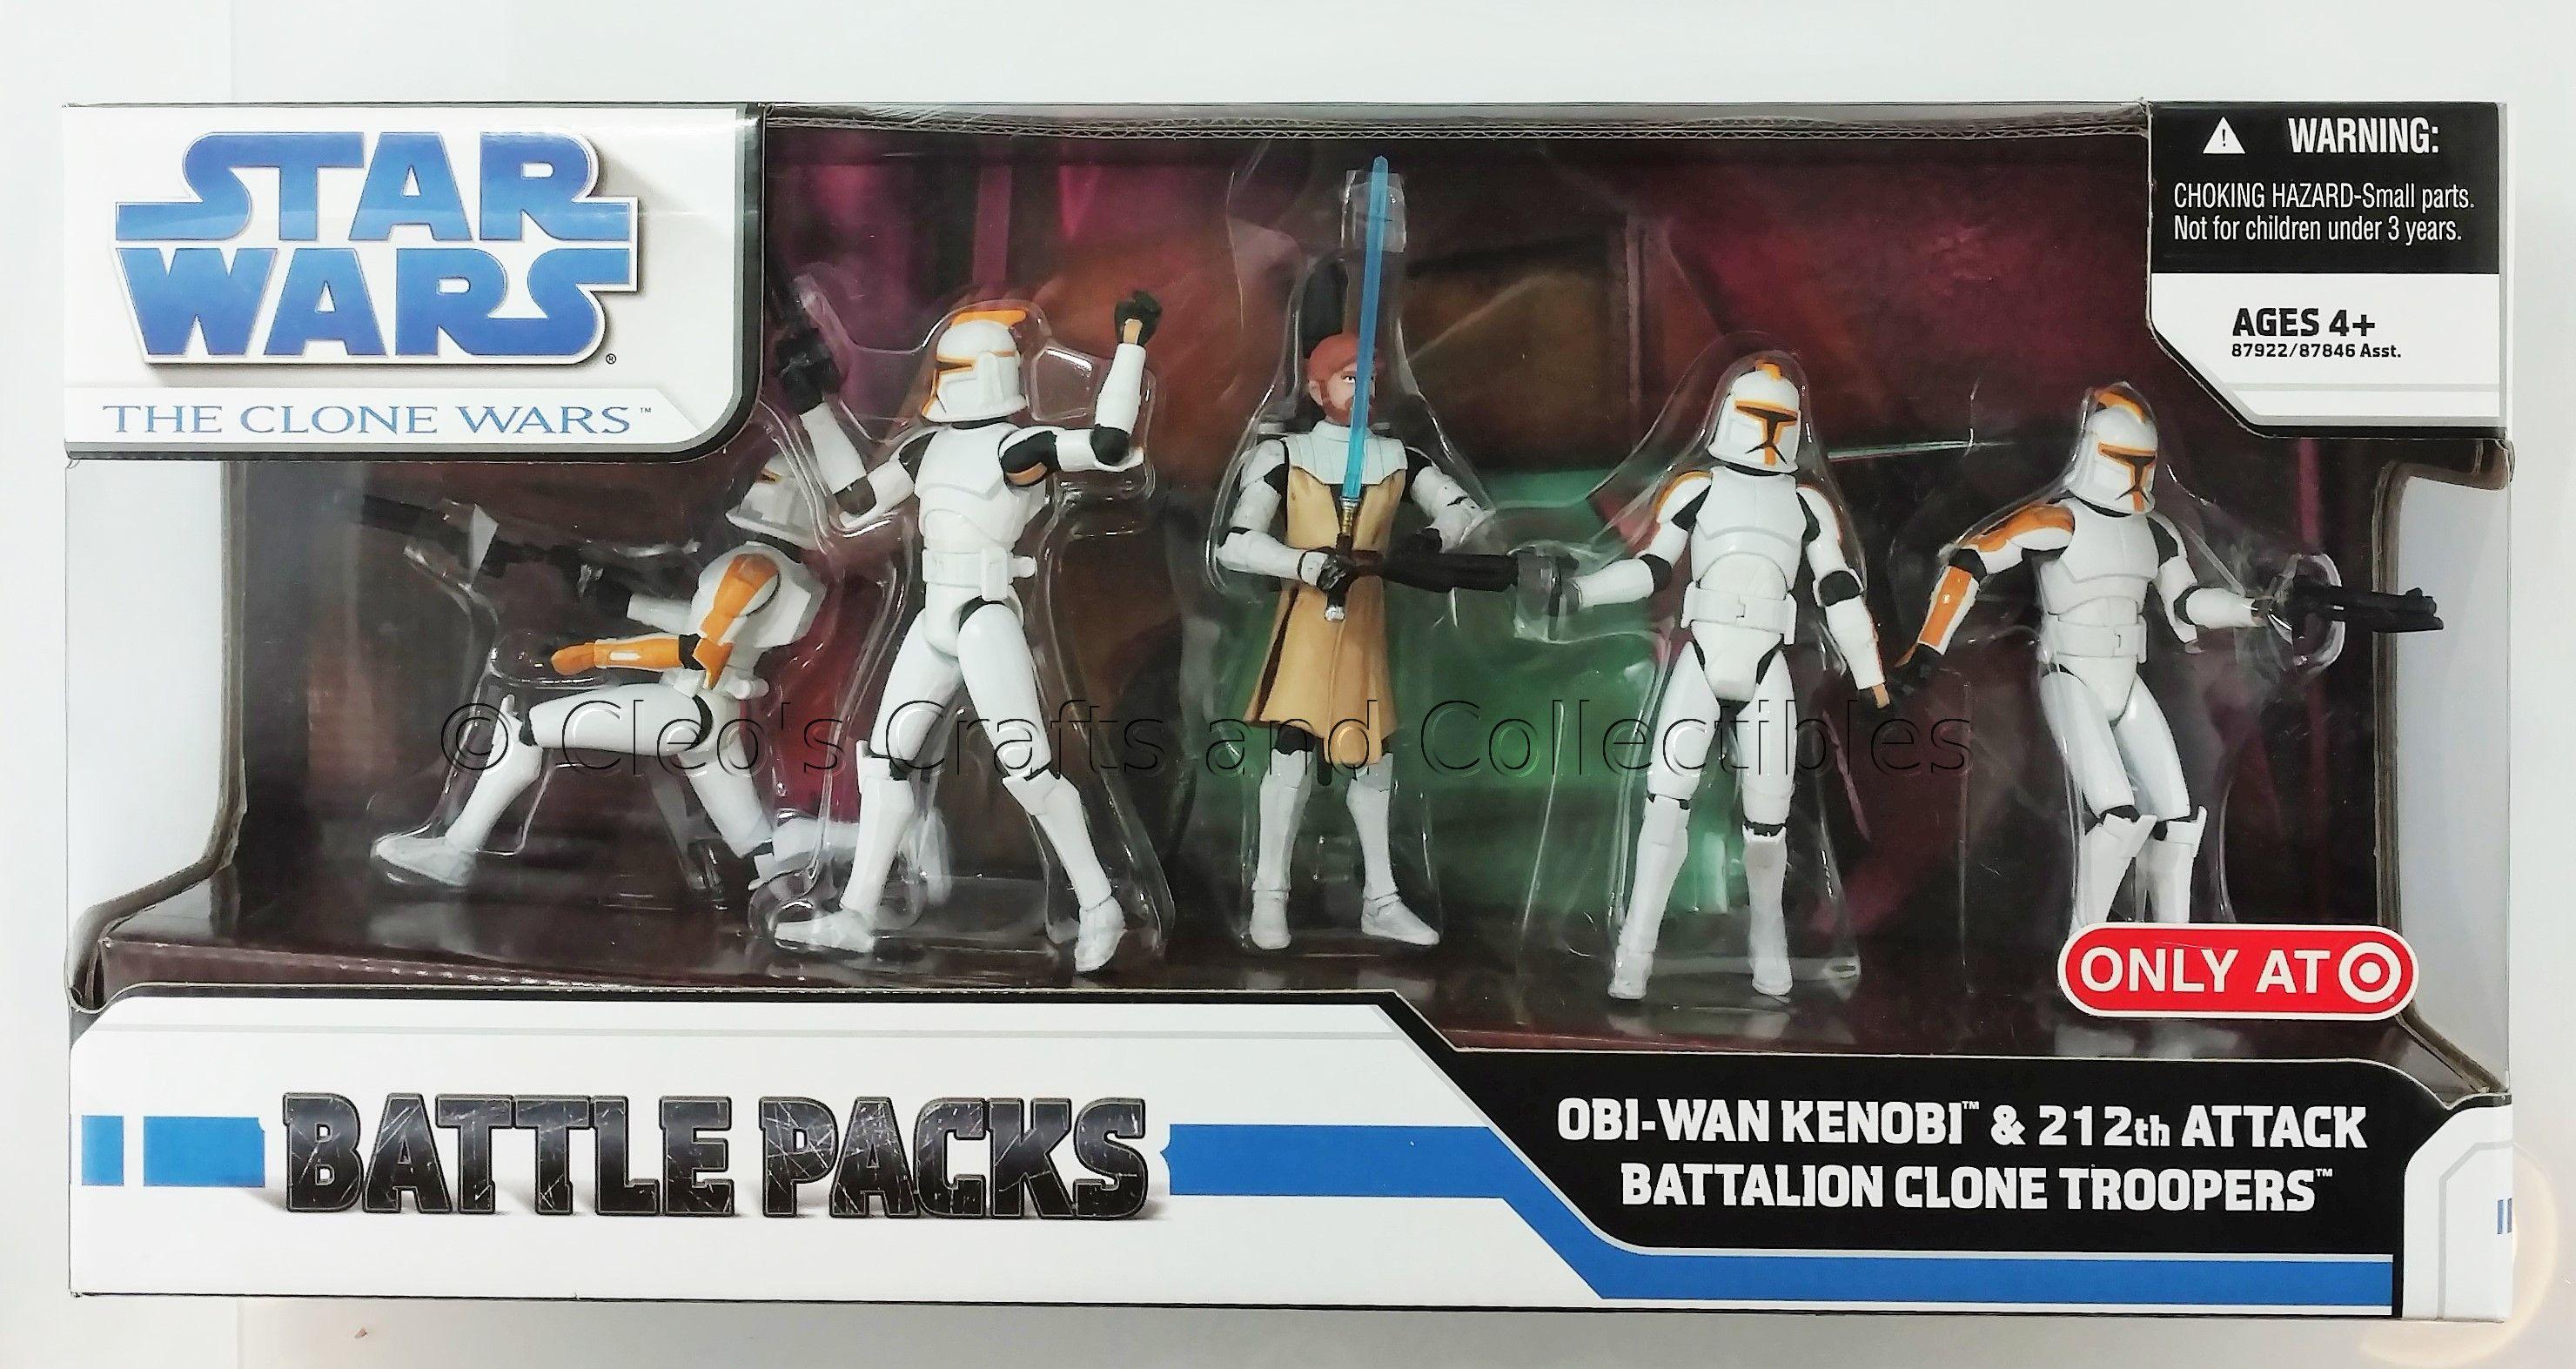 Obi-Wan Kenobi and the 212th Battalion